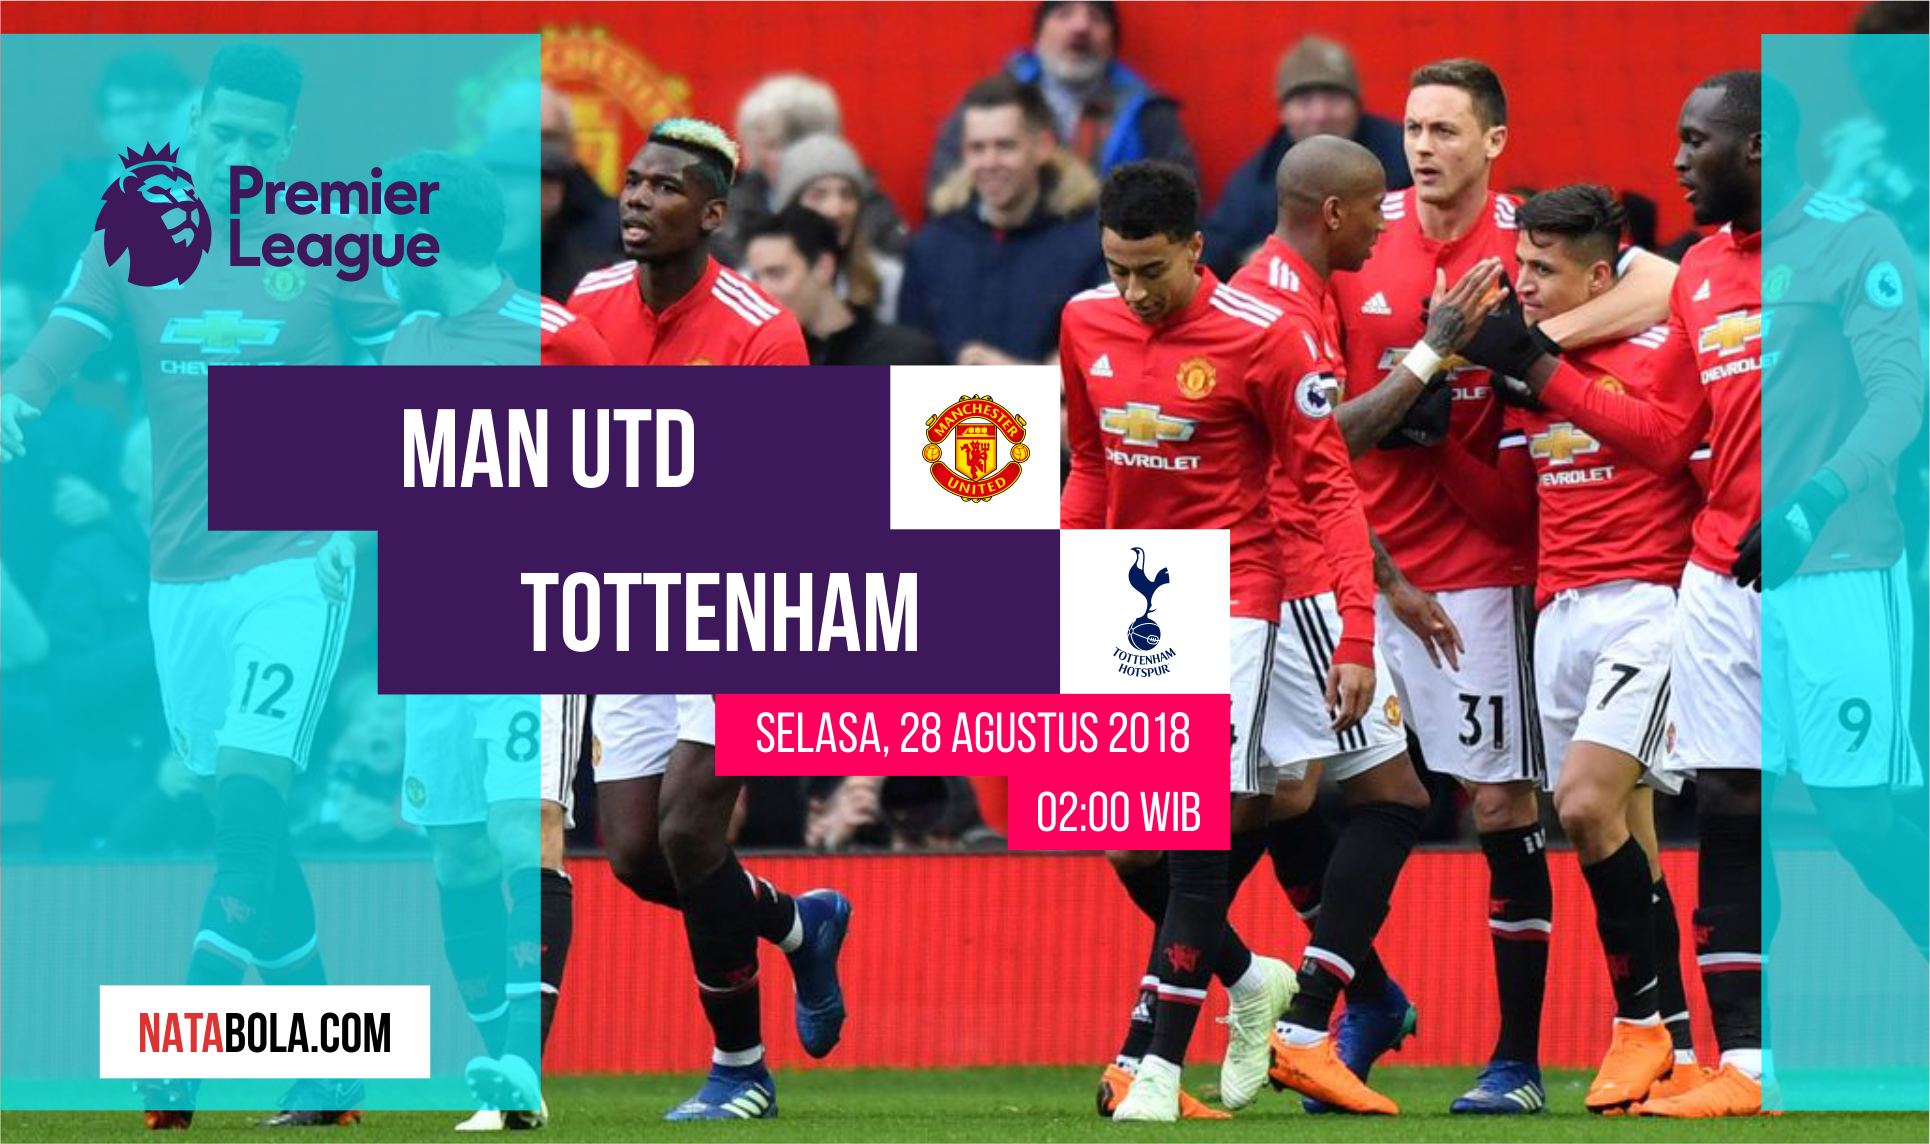 Jadwal & Prediksi Manchester United vs Tottenham Selasa